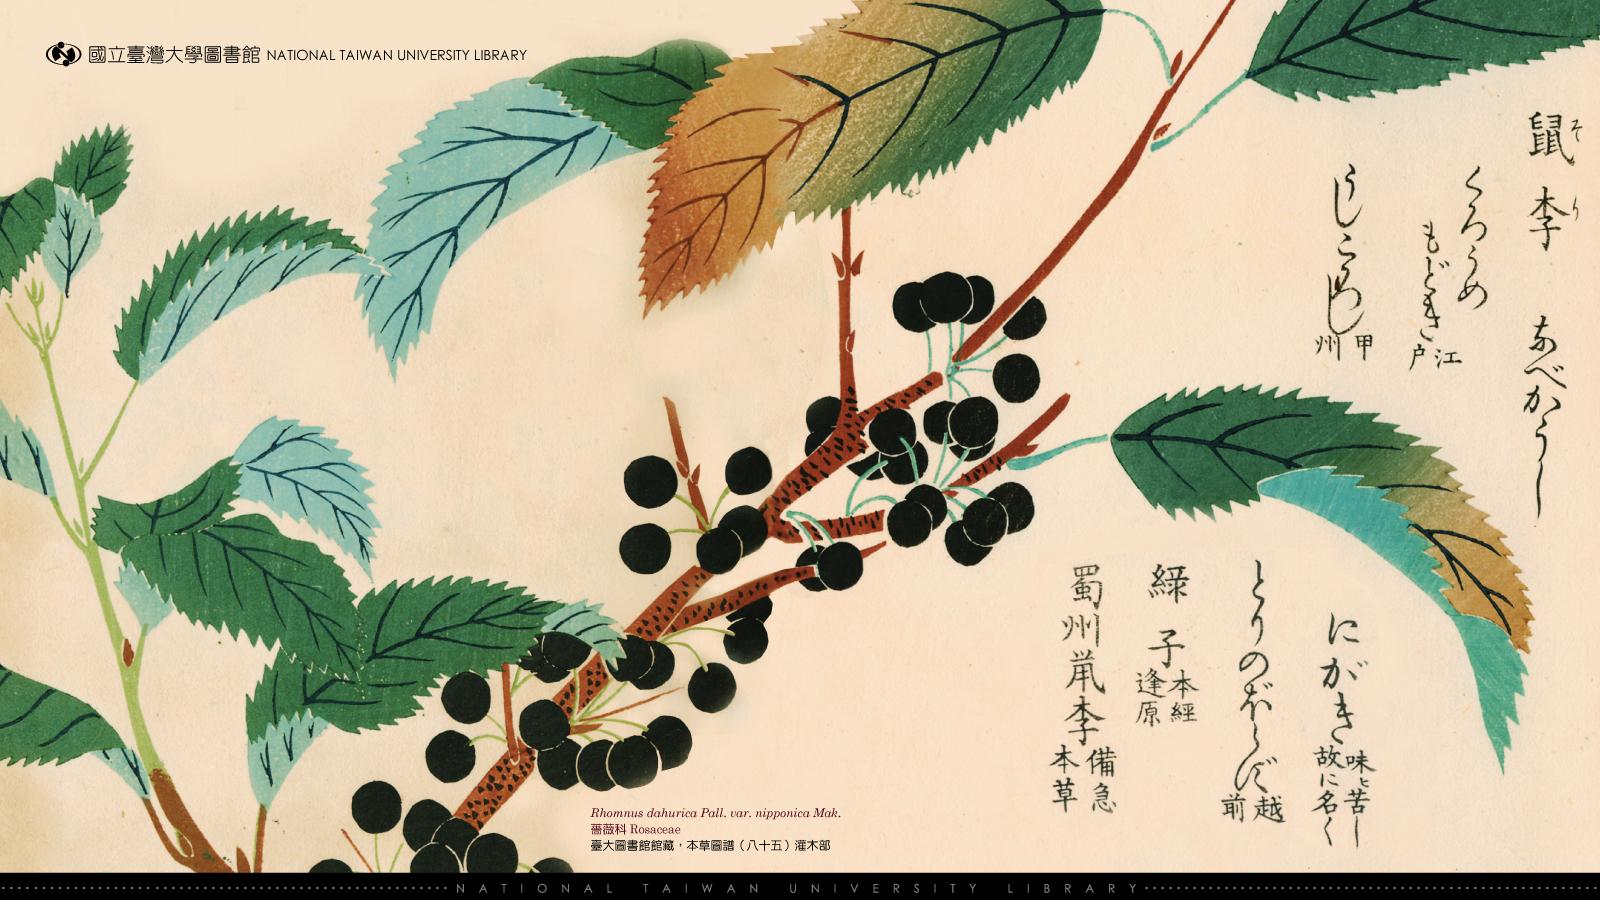 wallpaper 2010 | 国立台湾大学图书馆